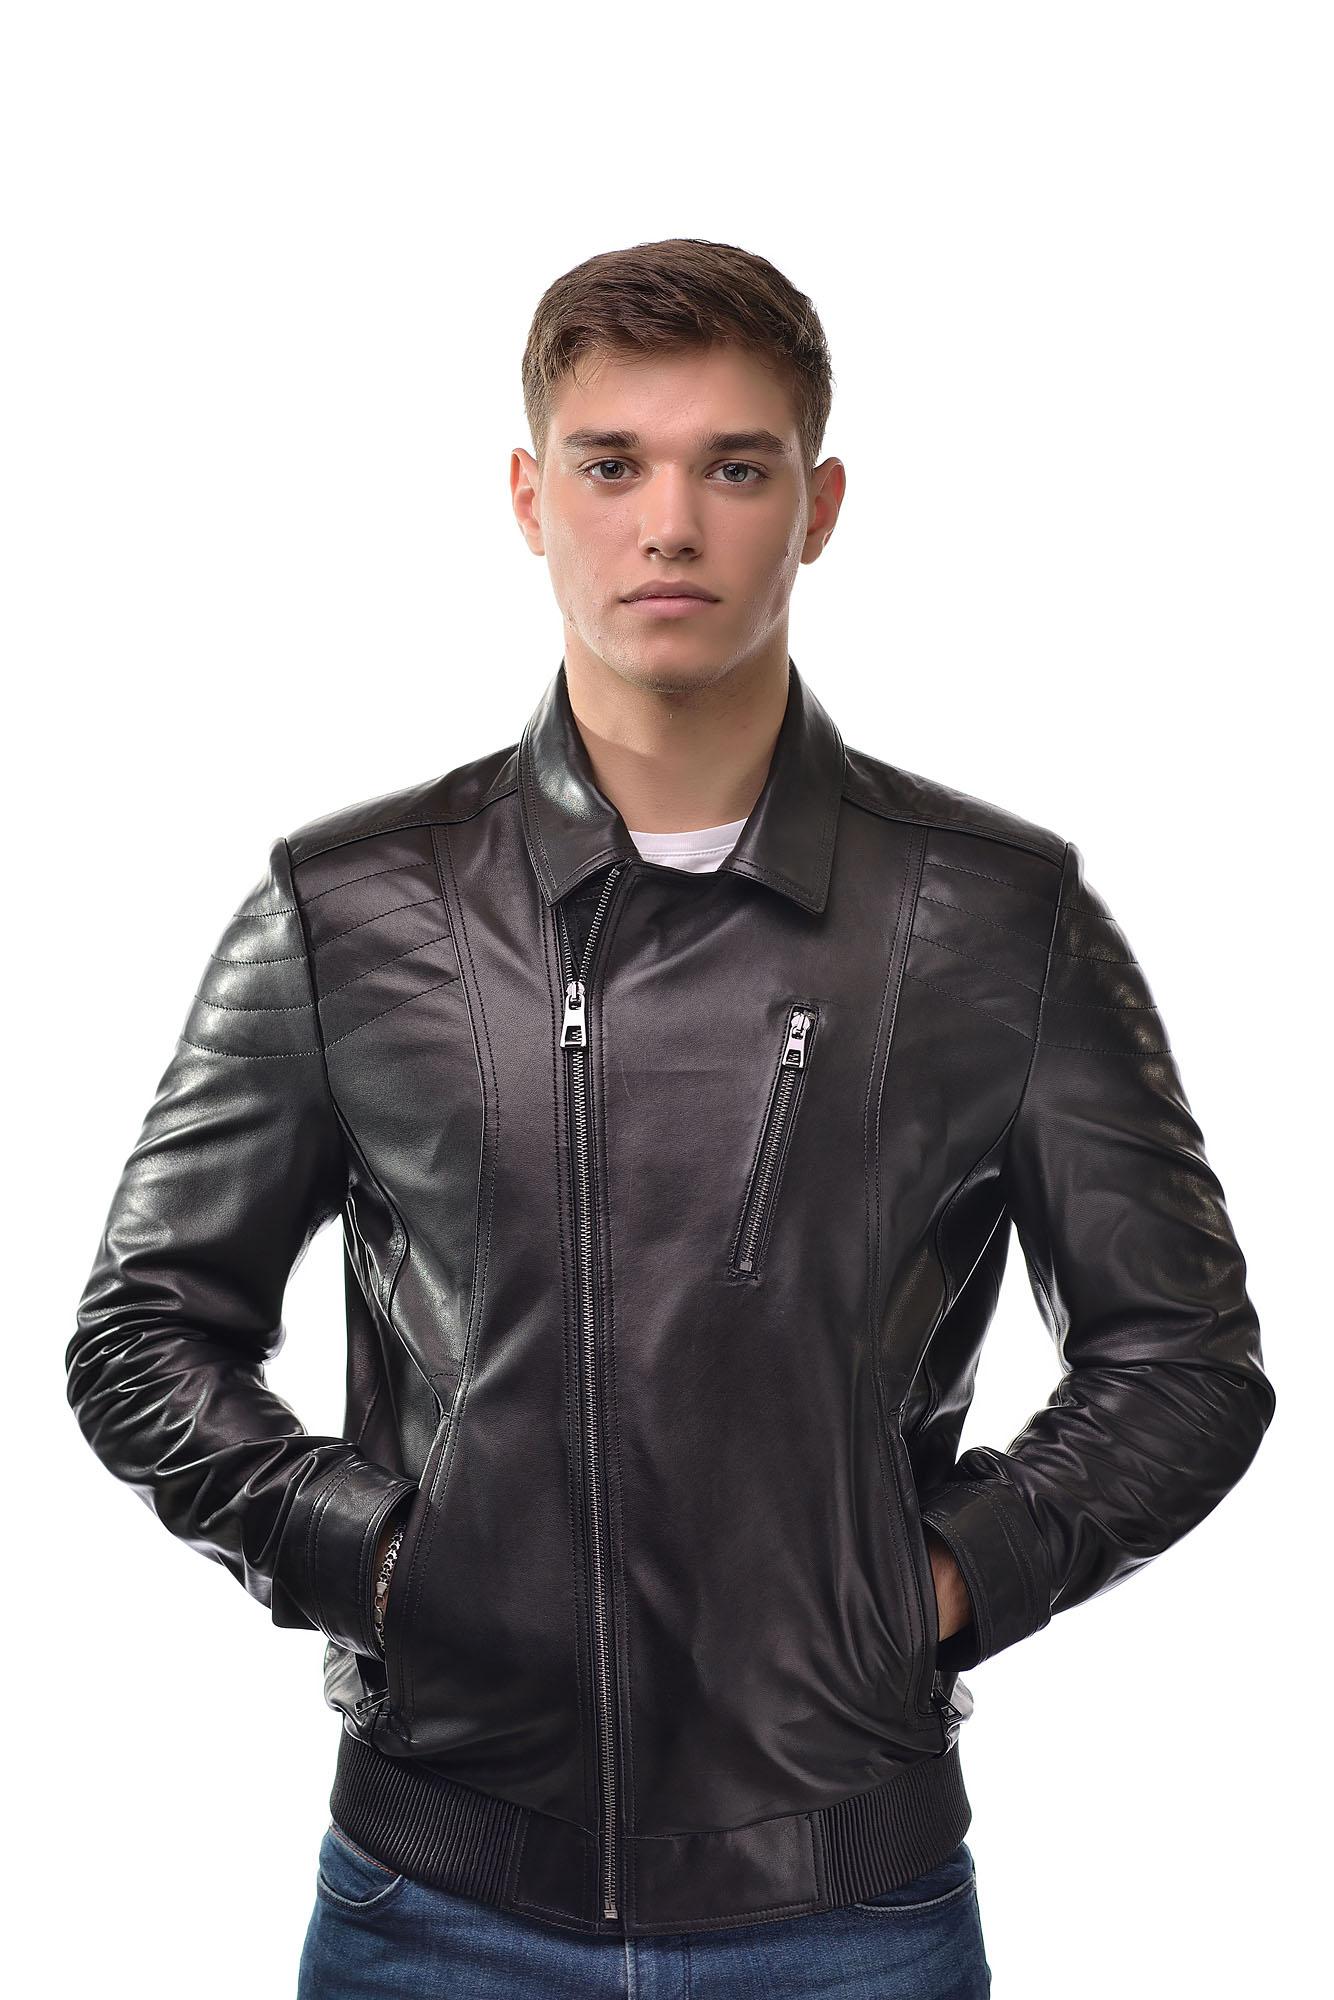 Мужская Кожаная куртка — косуха6162